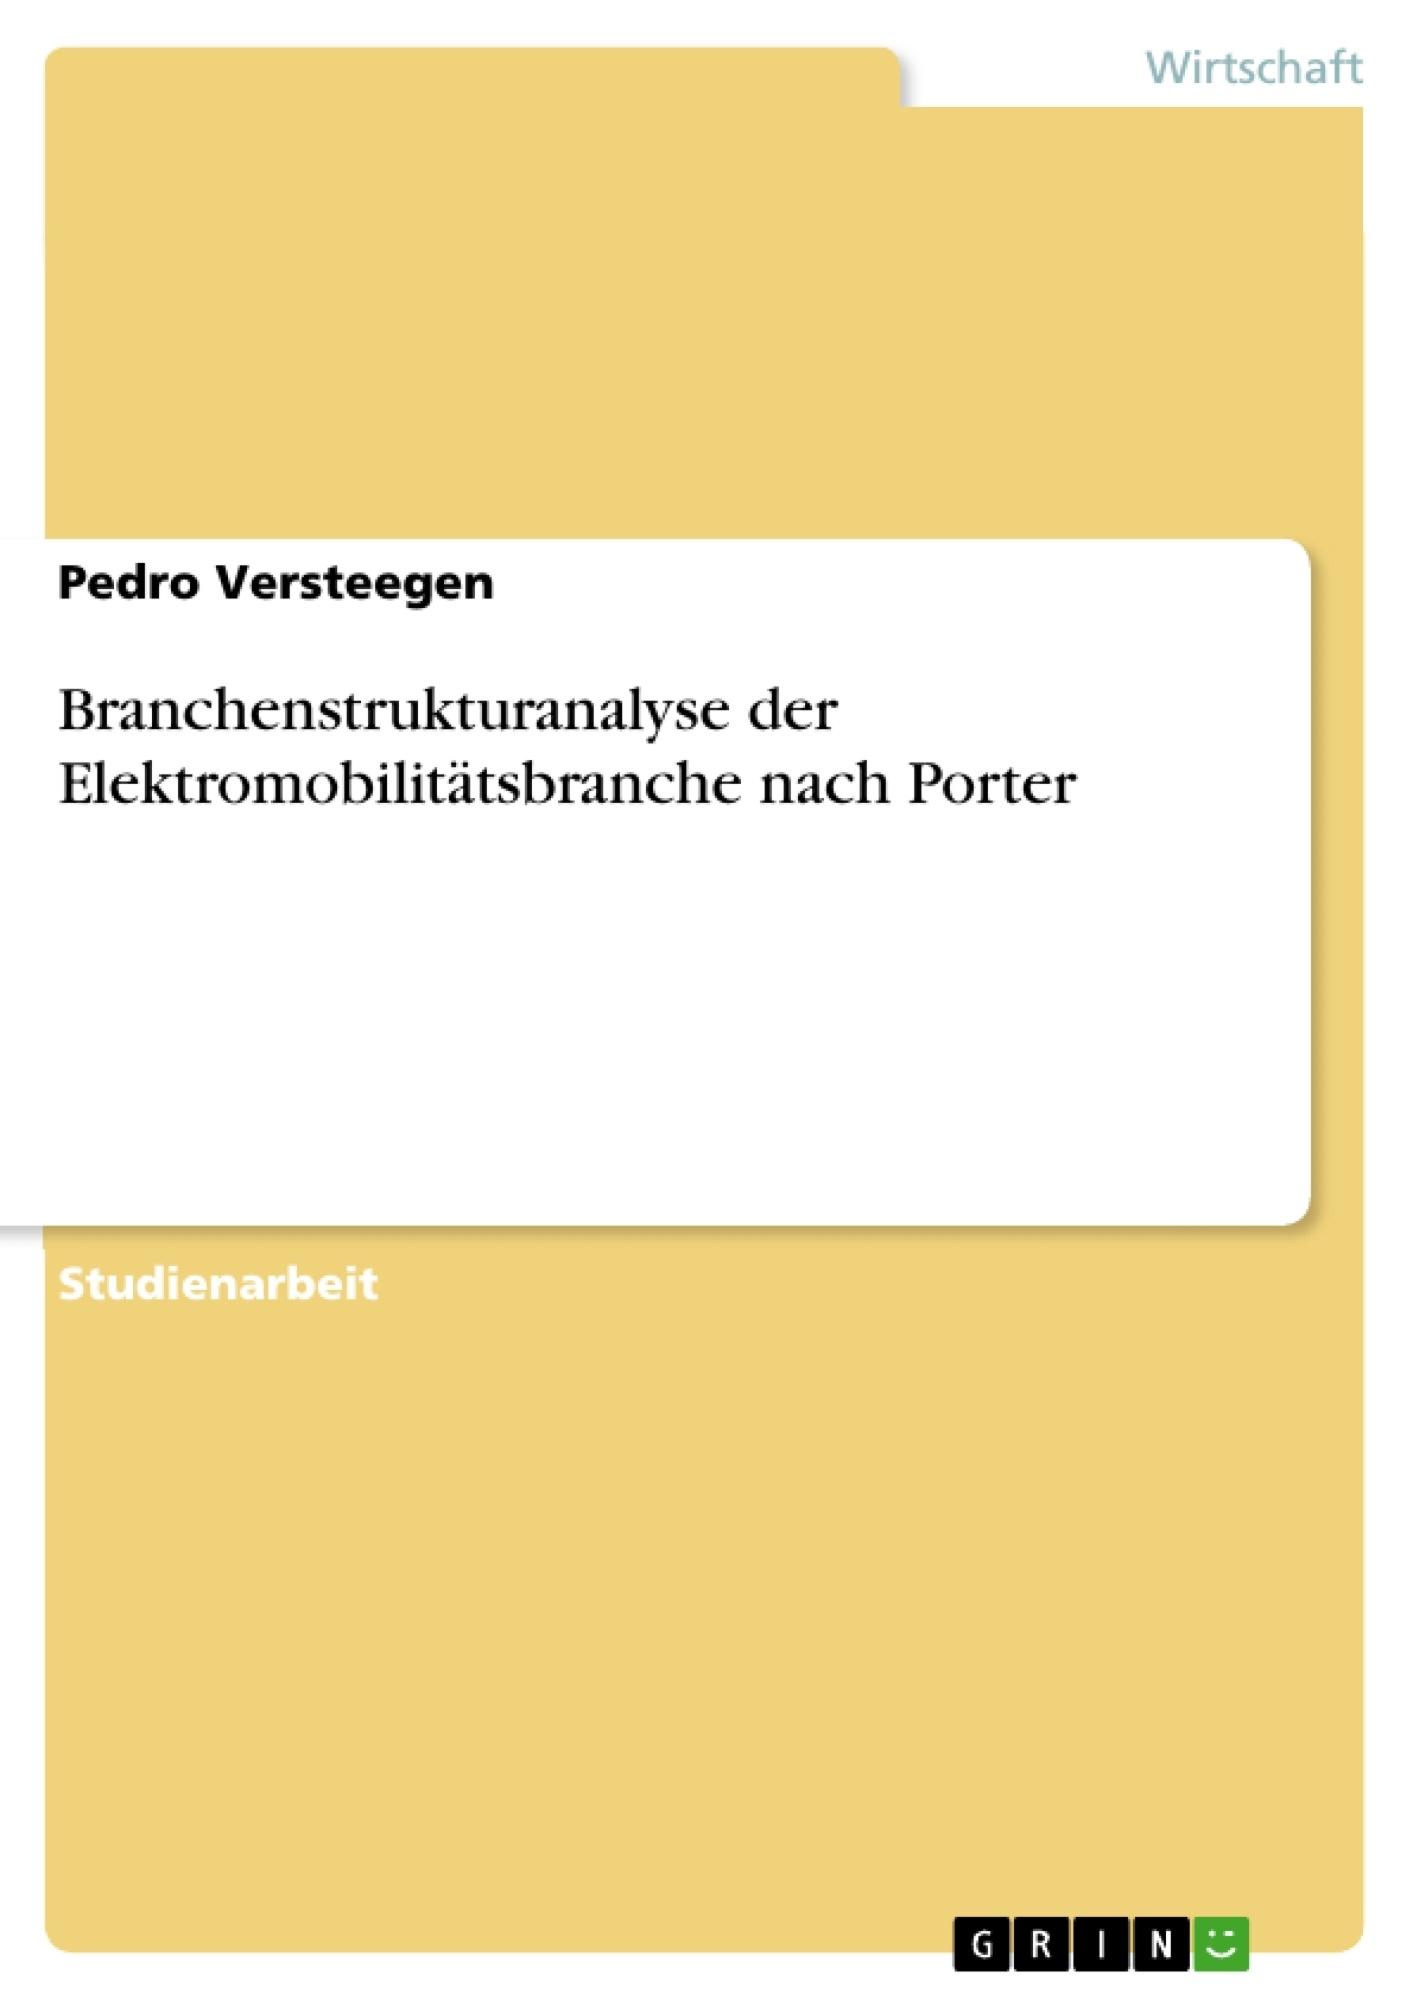 Titel: Branchenstrukturanalyse der Elektromobilitätsbranche nach Porter